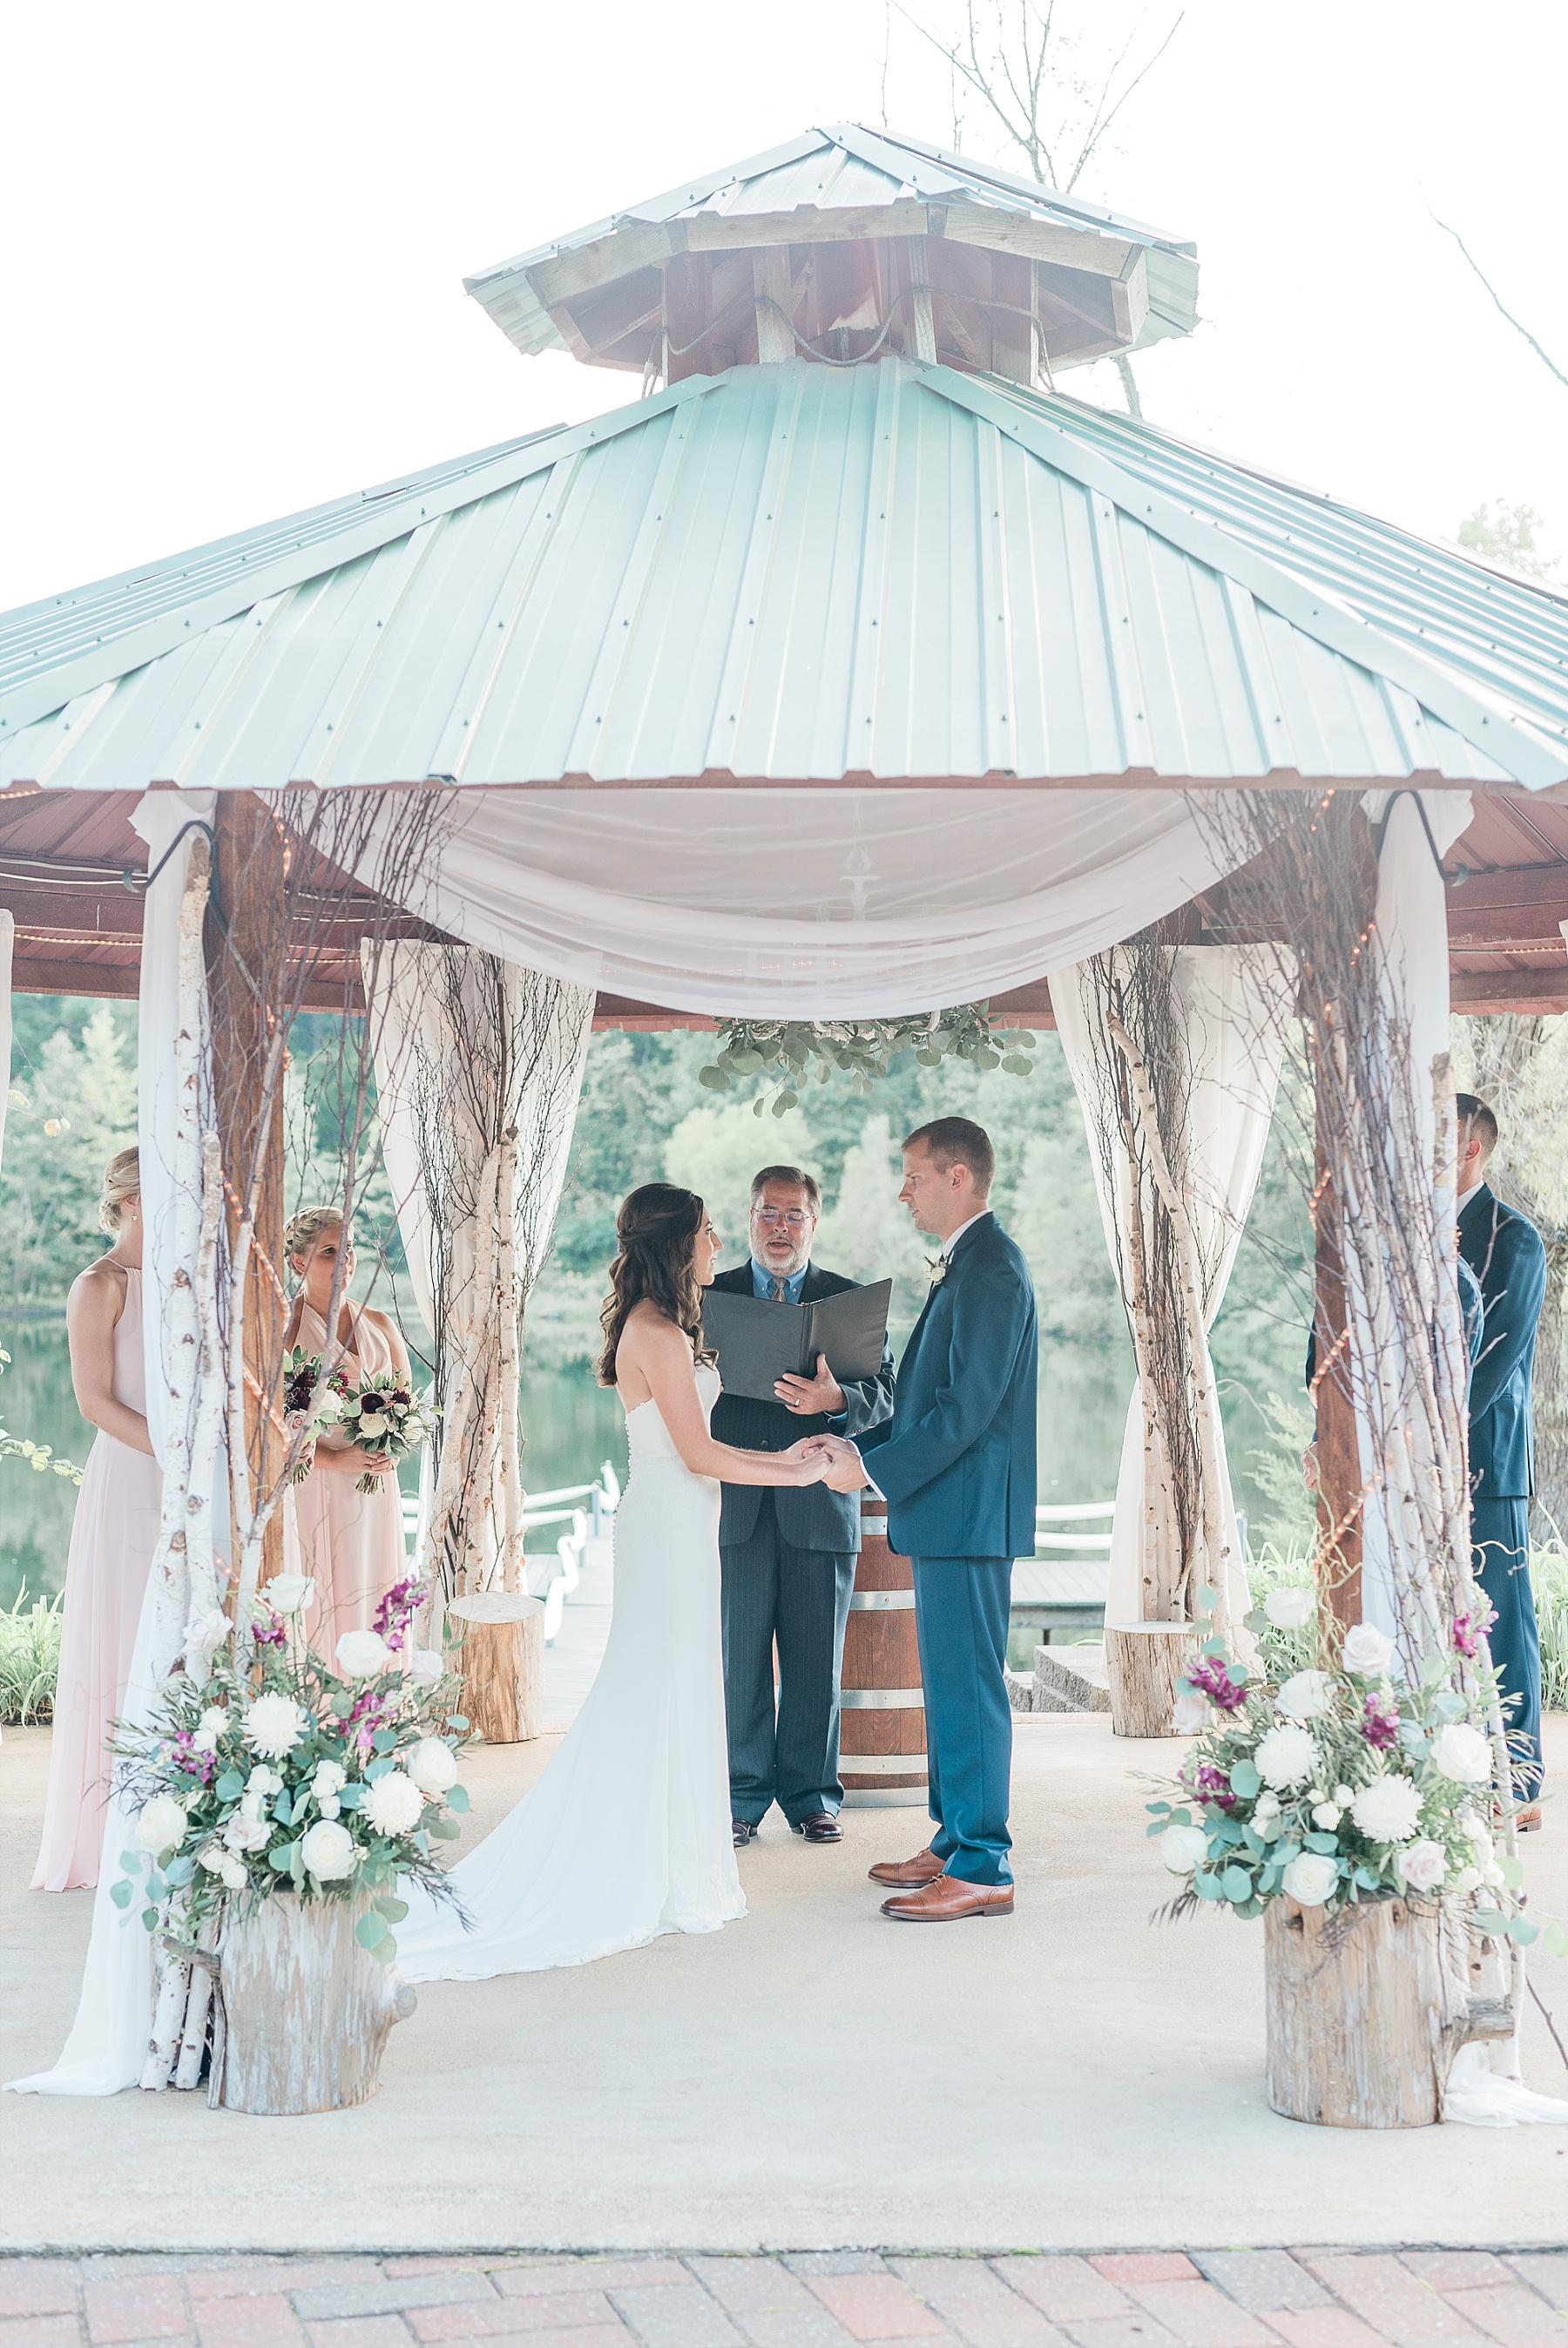 Romantic Summer Sunset Wedding Ceremony at Little Piney Lodge St. Louis Missouri by Kelsi Kliethermes Photography Fine Art Photographer_0057.jpg